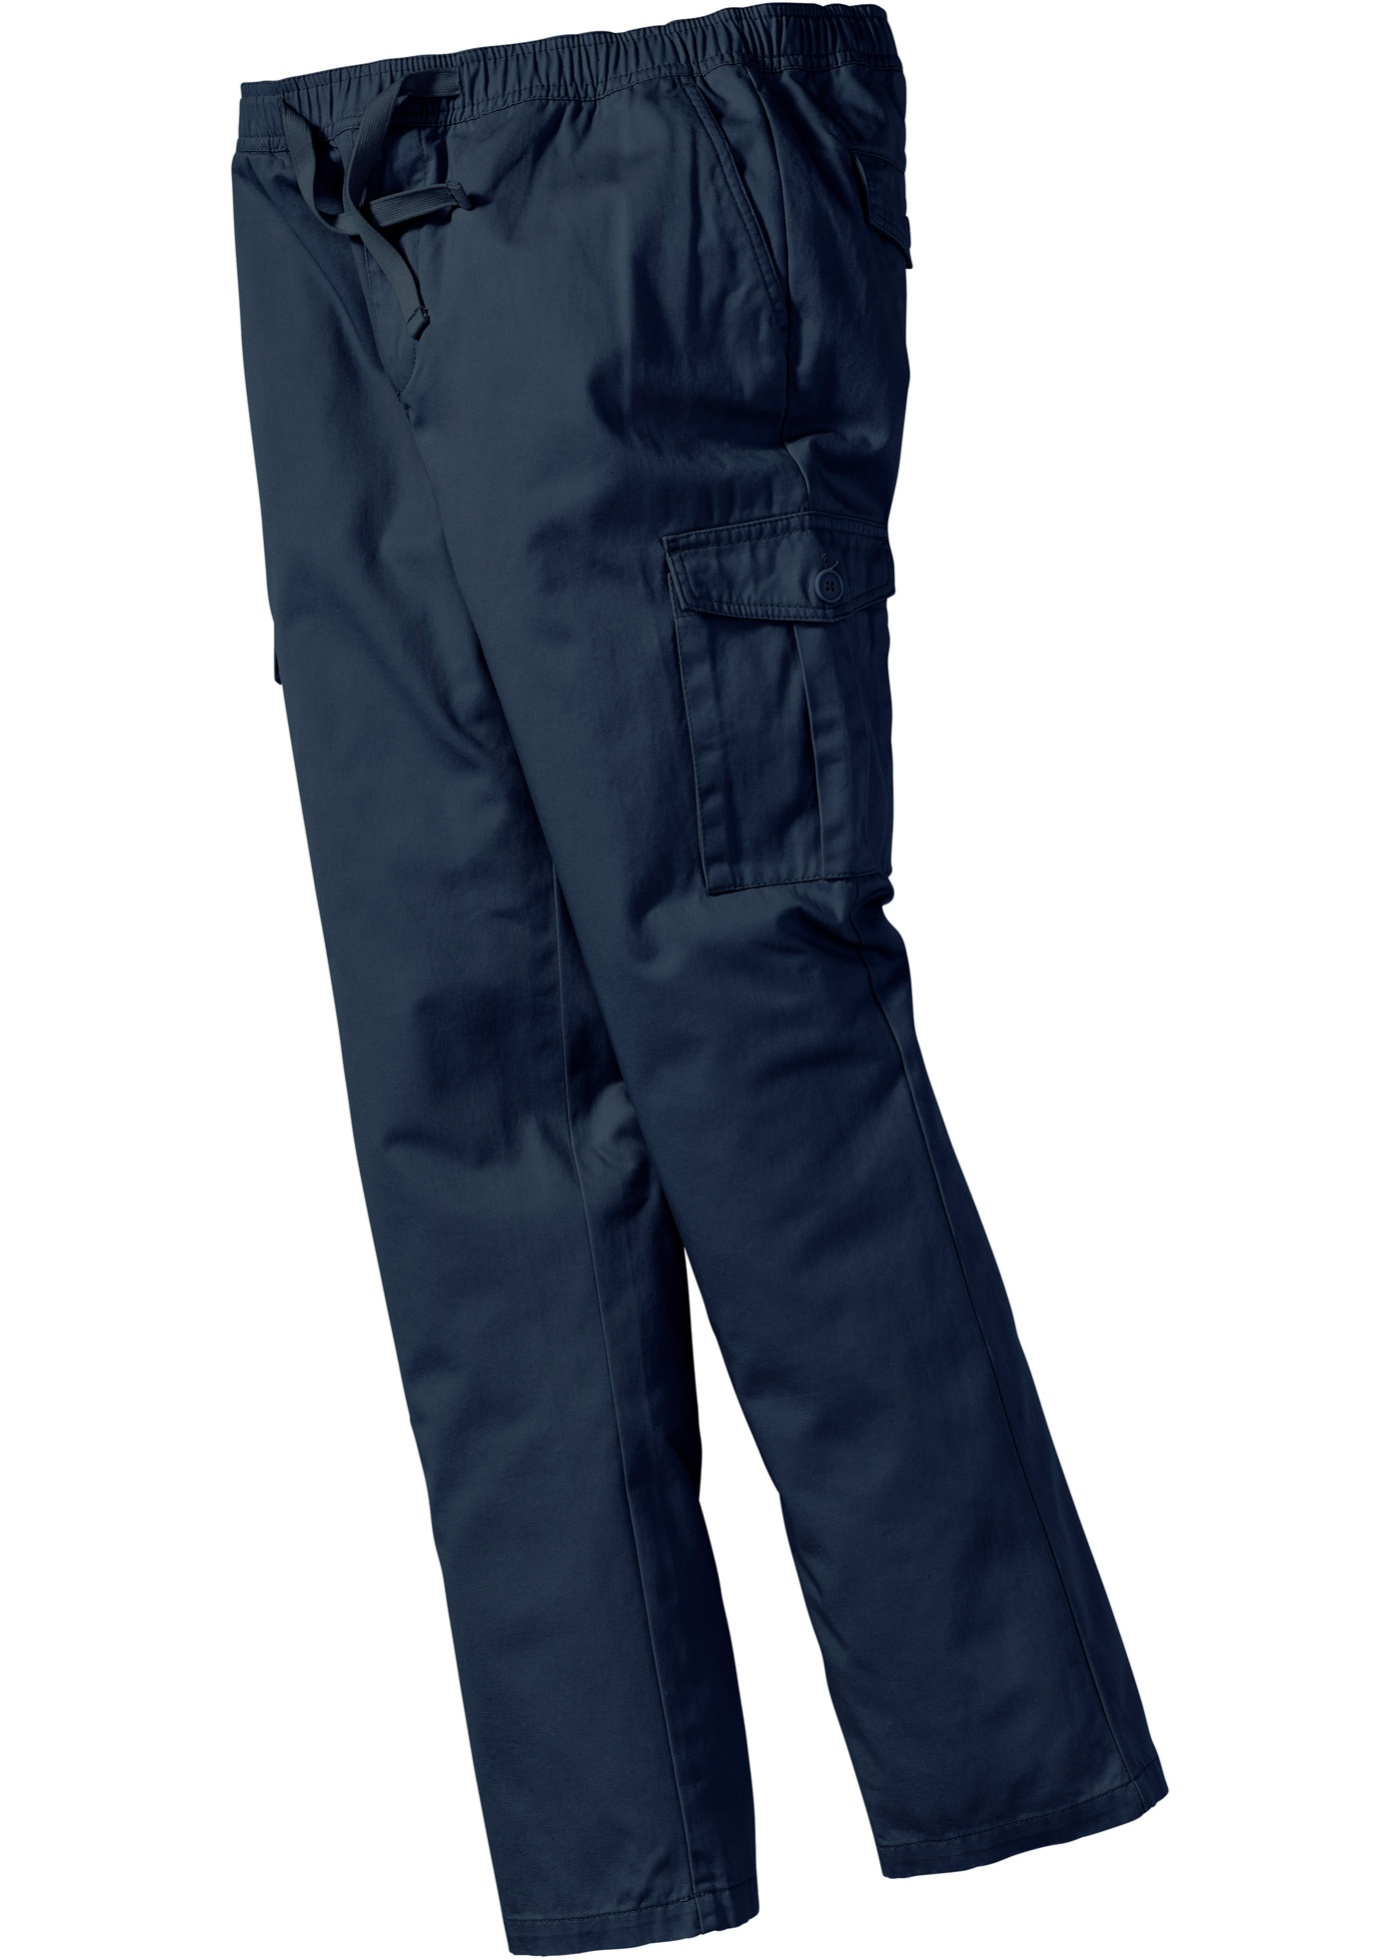 Kargo kalhoty Regular Fit - Modrá